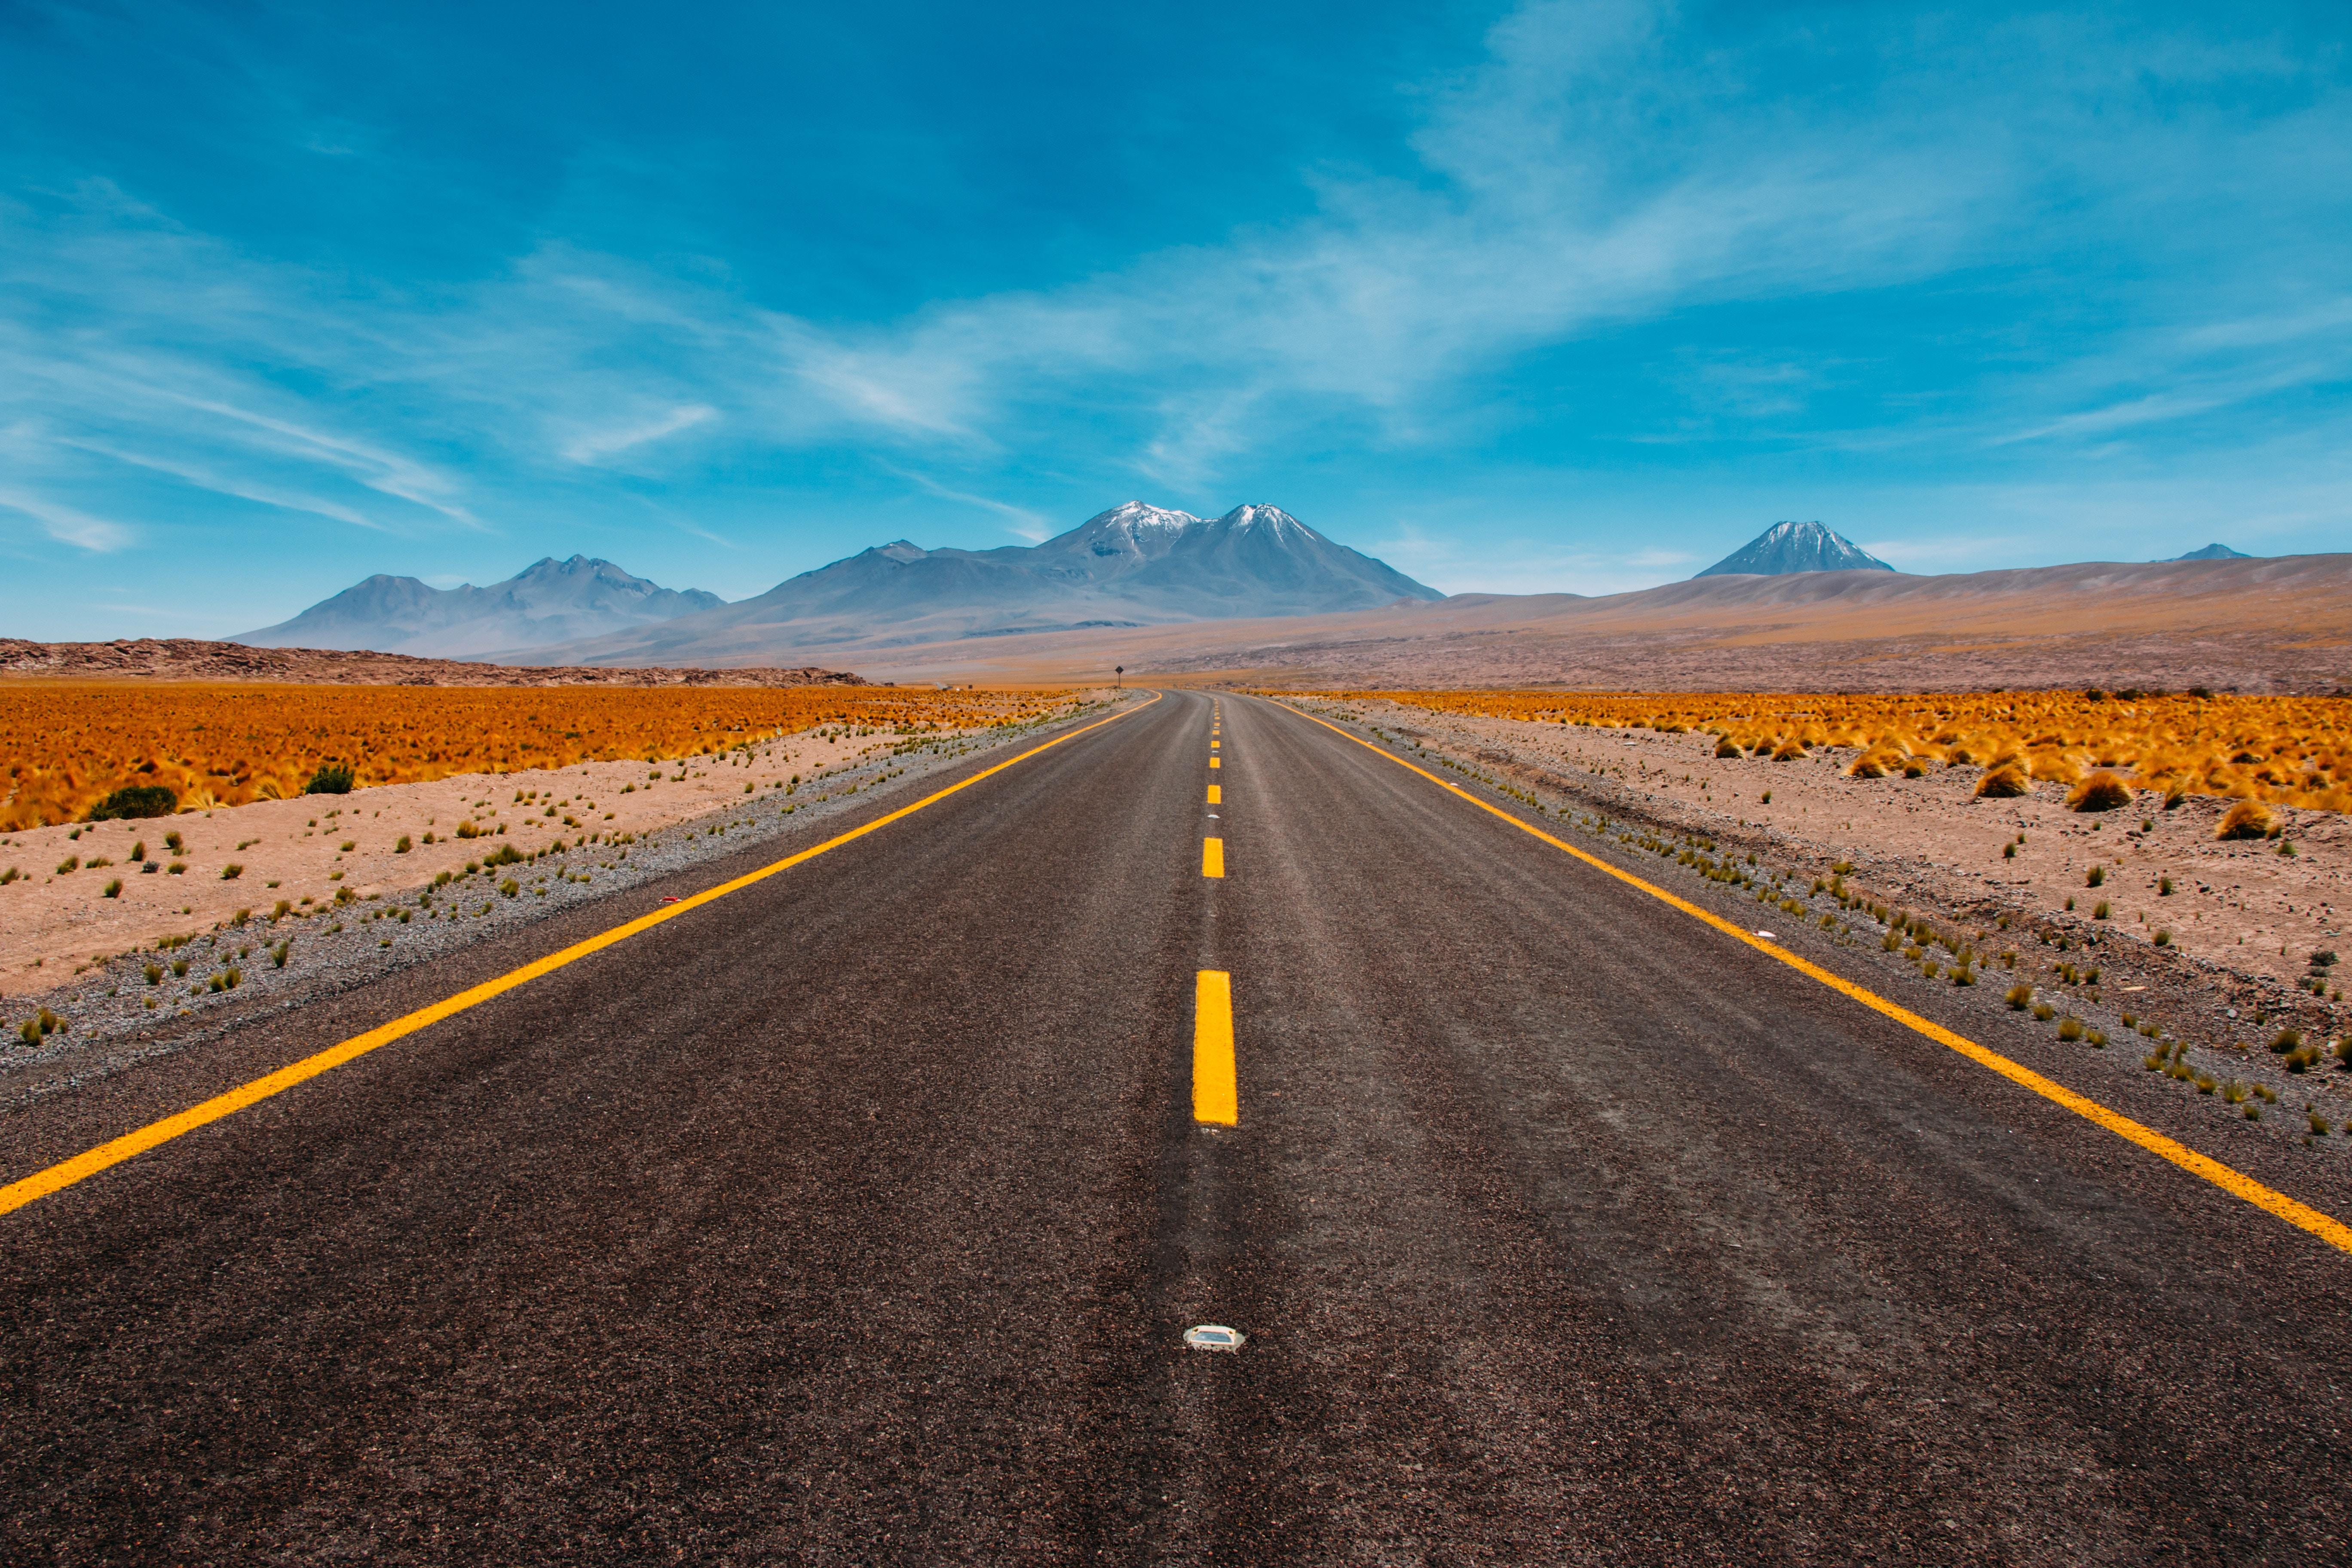 Quarterly Roadmap Webinar for Customers - Dec. 12 @ 10am - 11:30am PT